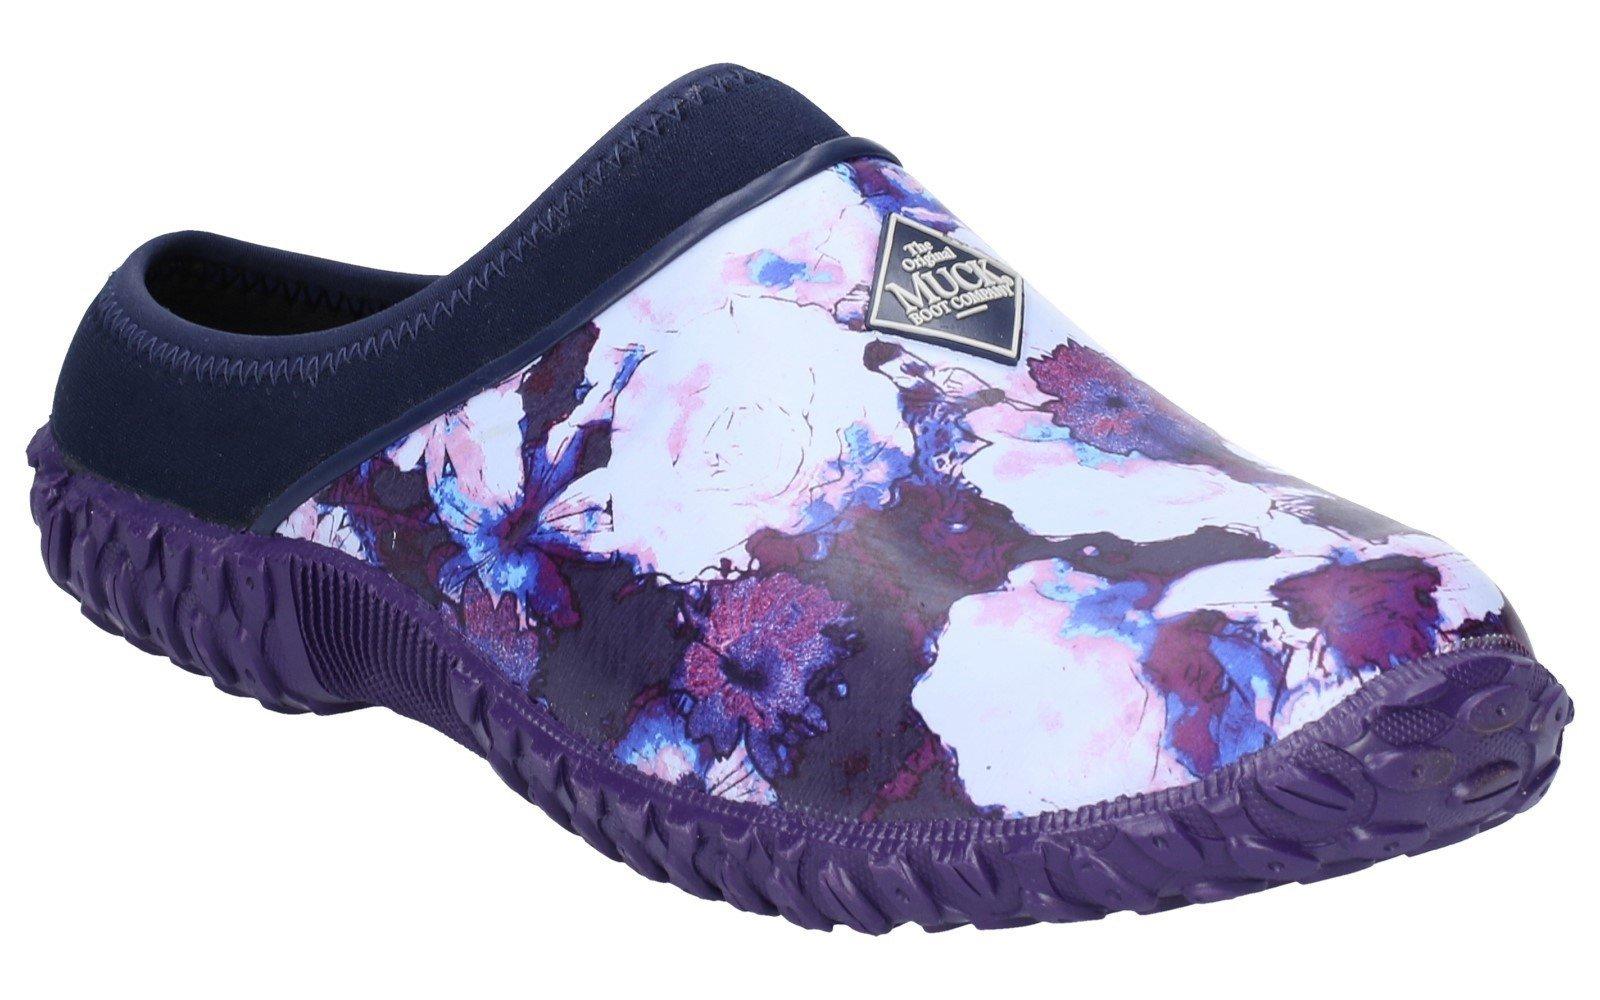 Muck Boots Women's Muckster II Slip On Clog Various Colours 28900 - Blue 3